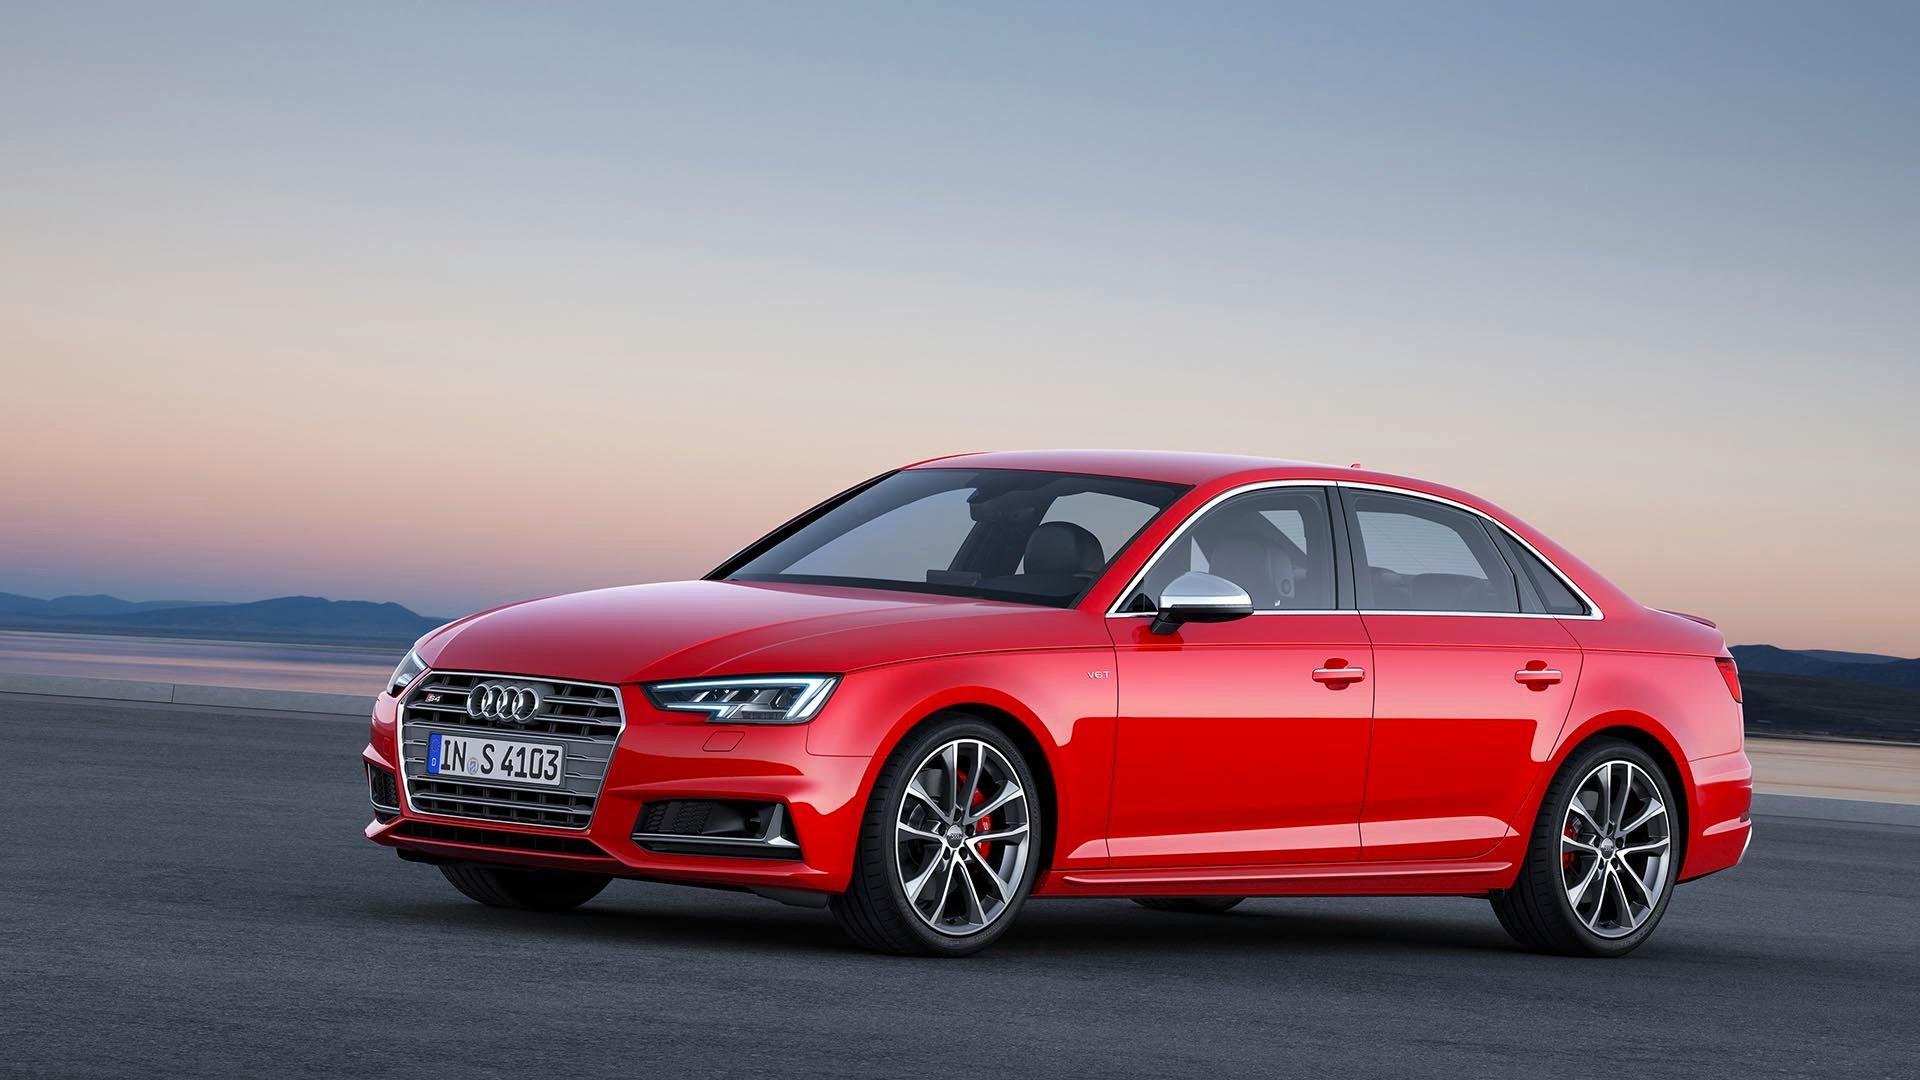 04_Audi S4 B9 3.0t front profile